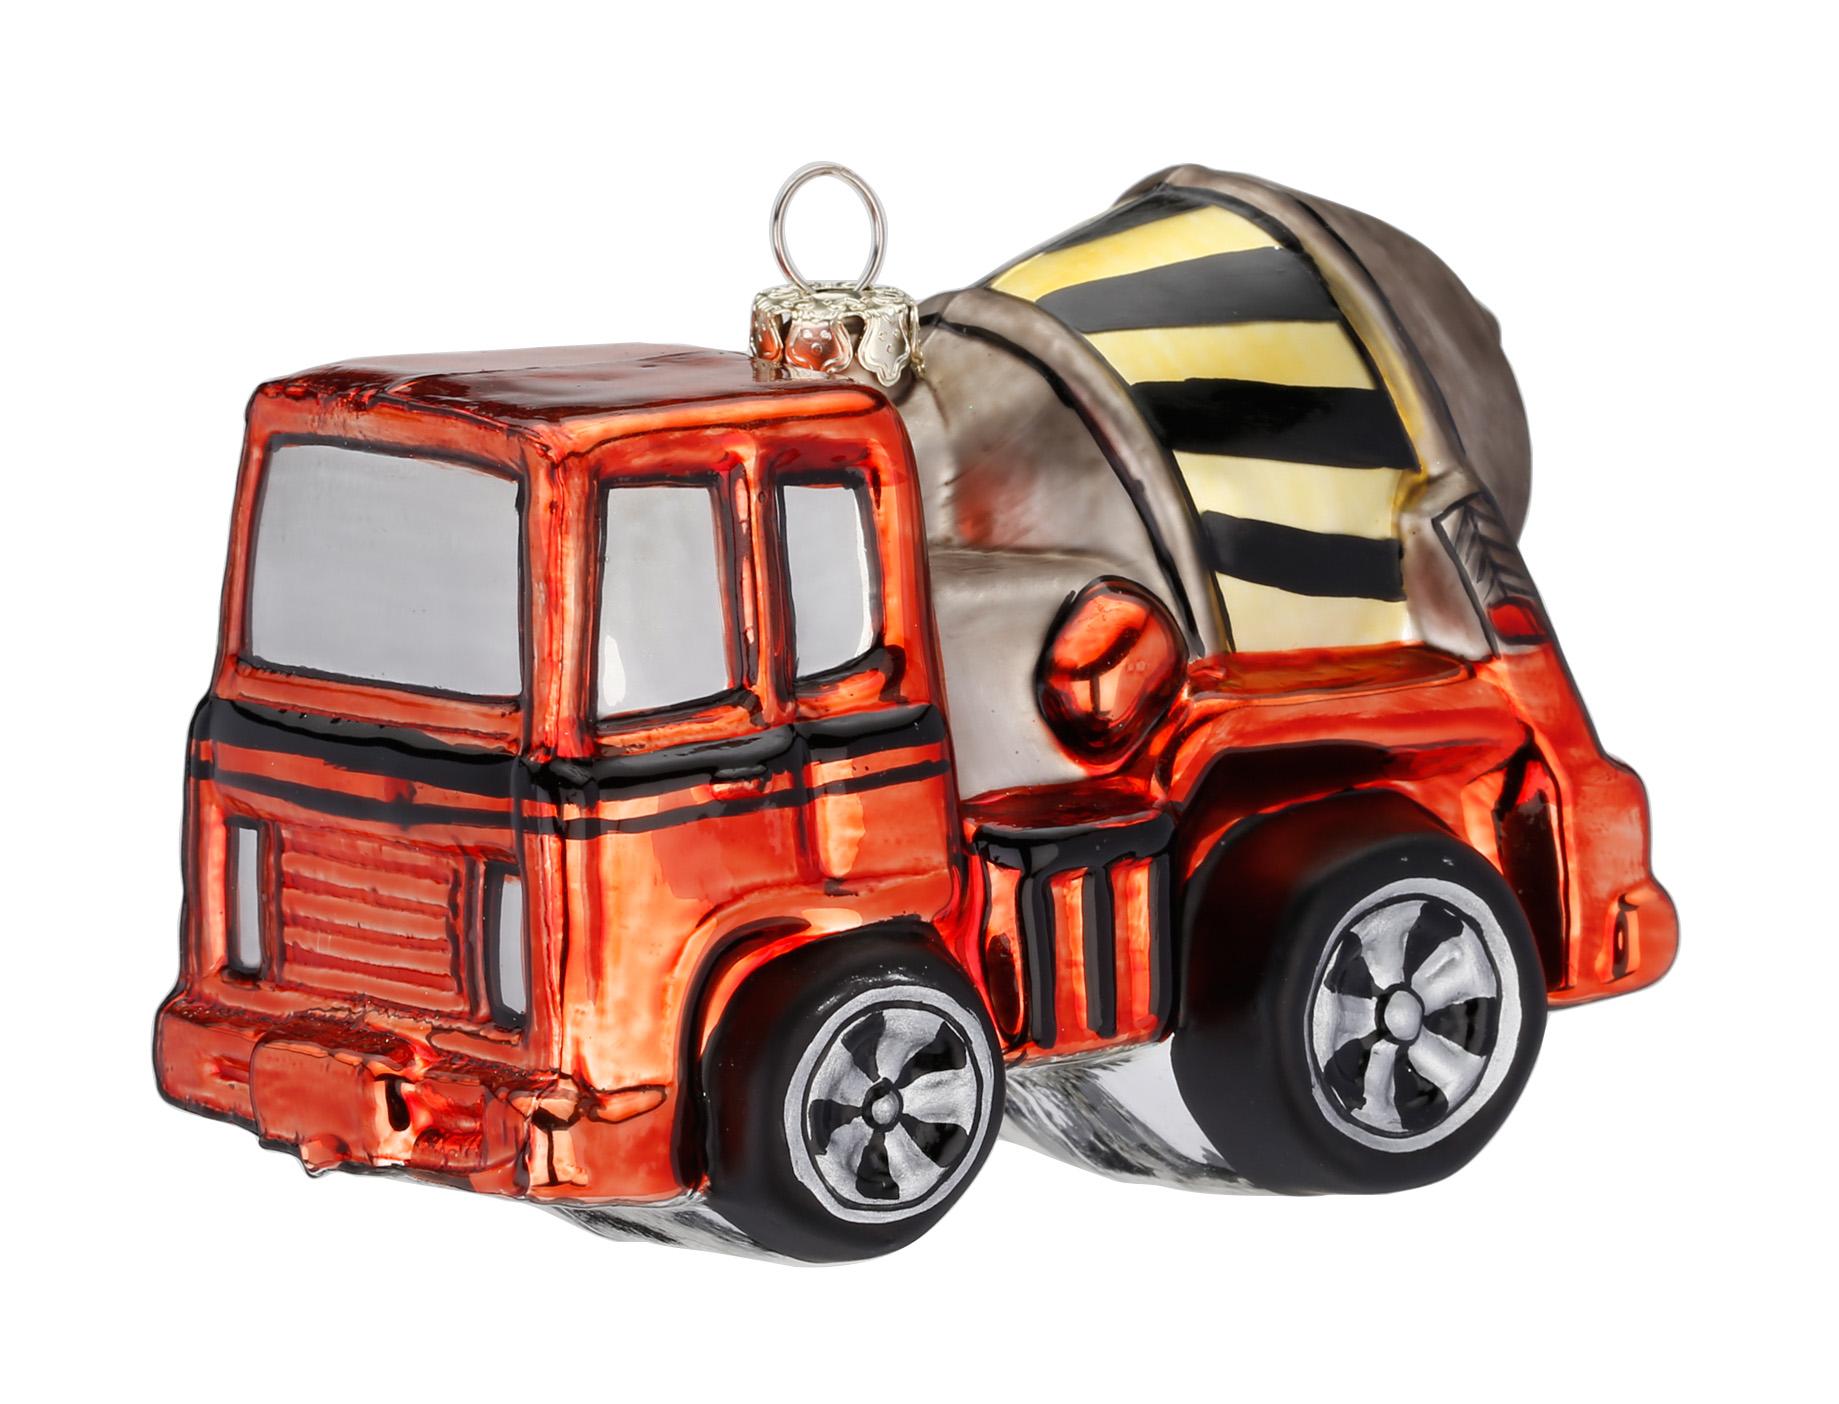 Christbaumschmuck Figuren Glas Transport Fahrzeuge Saisonartikel